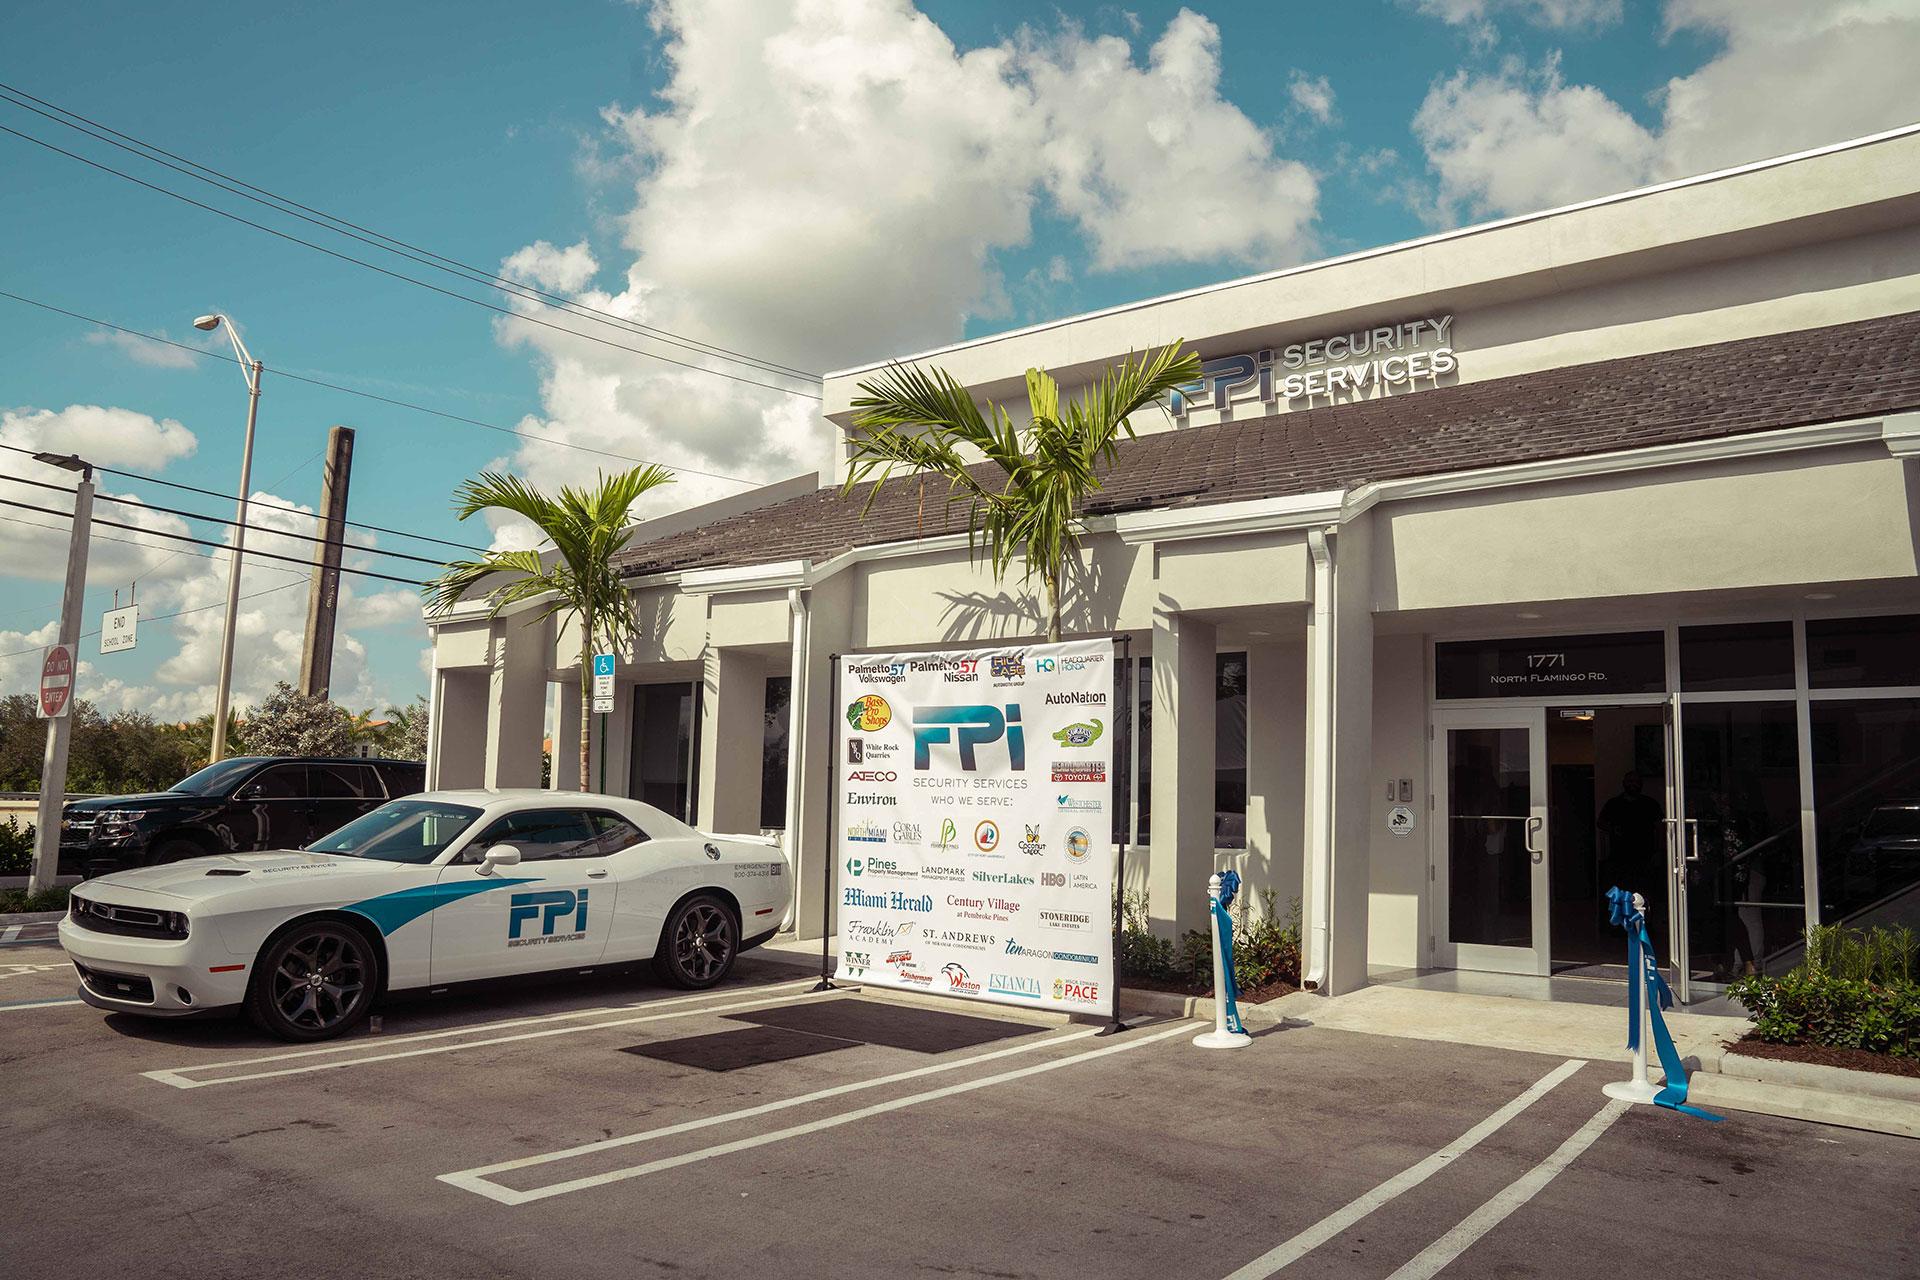 FPI Security Building